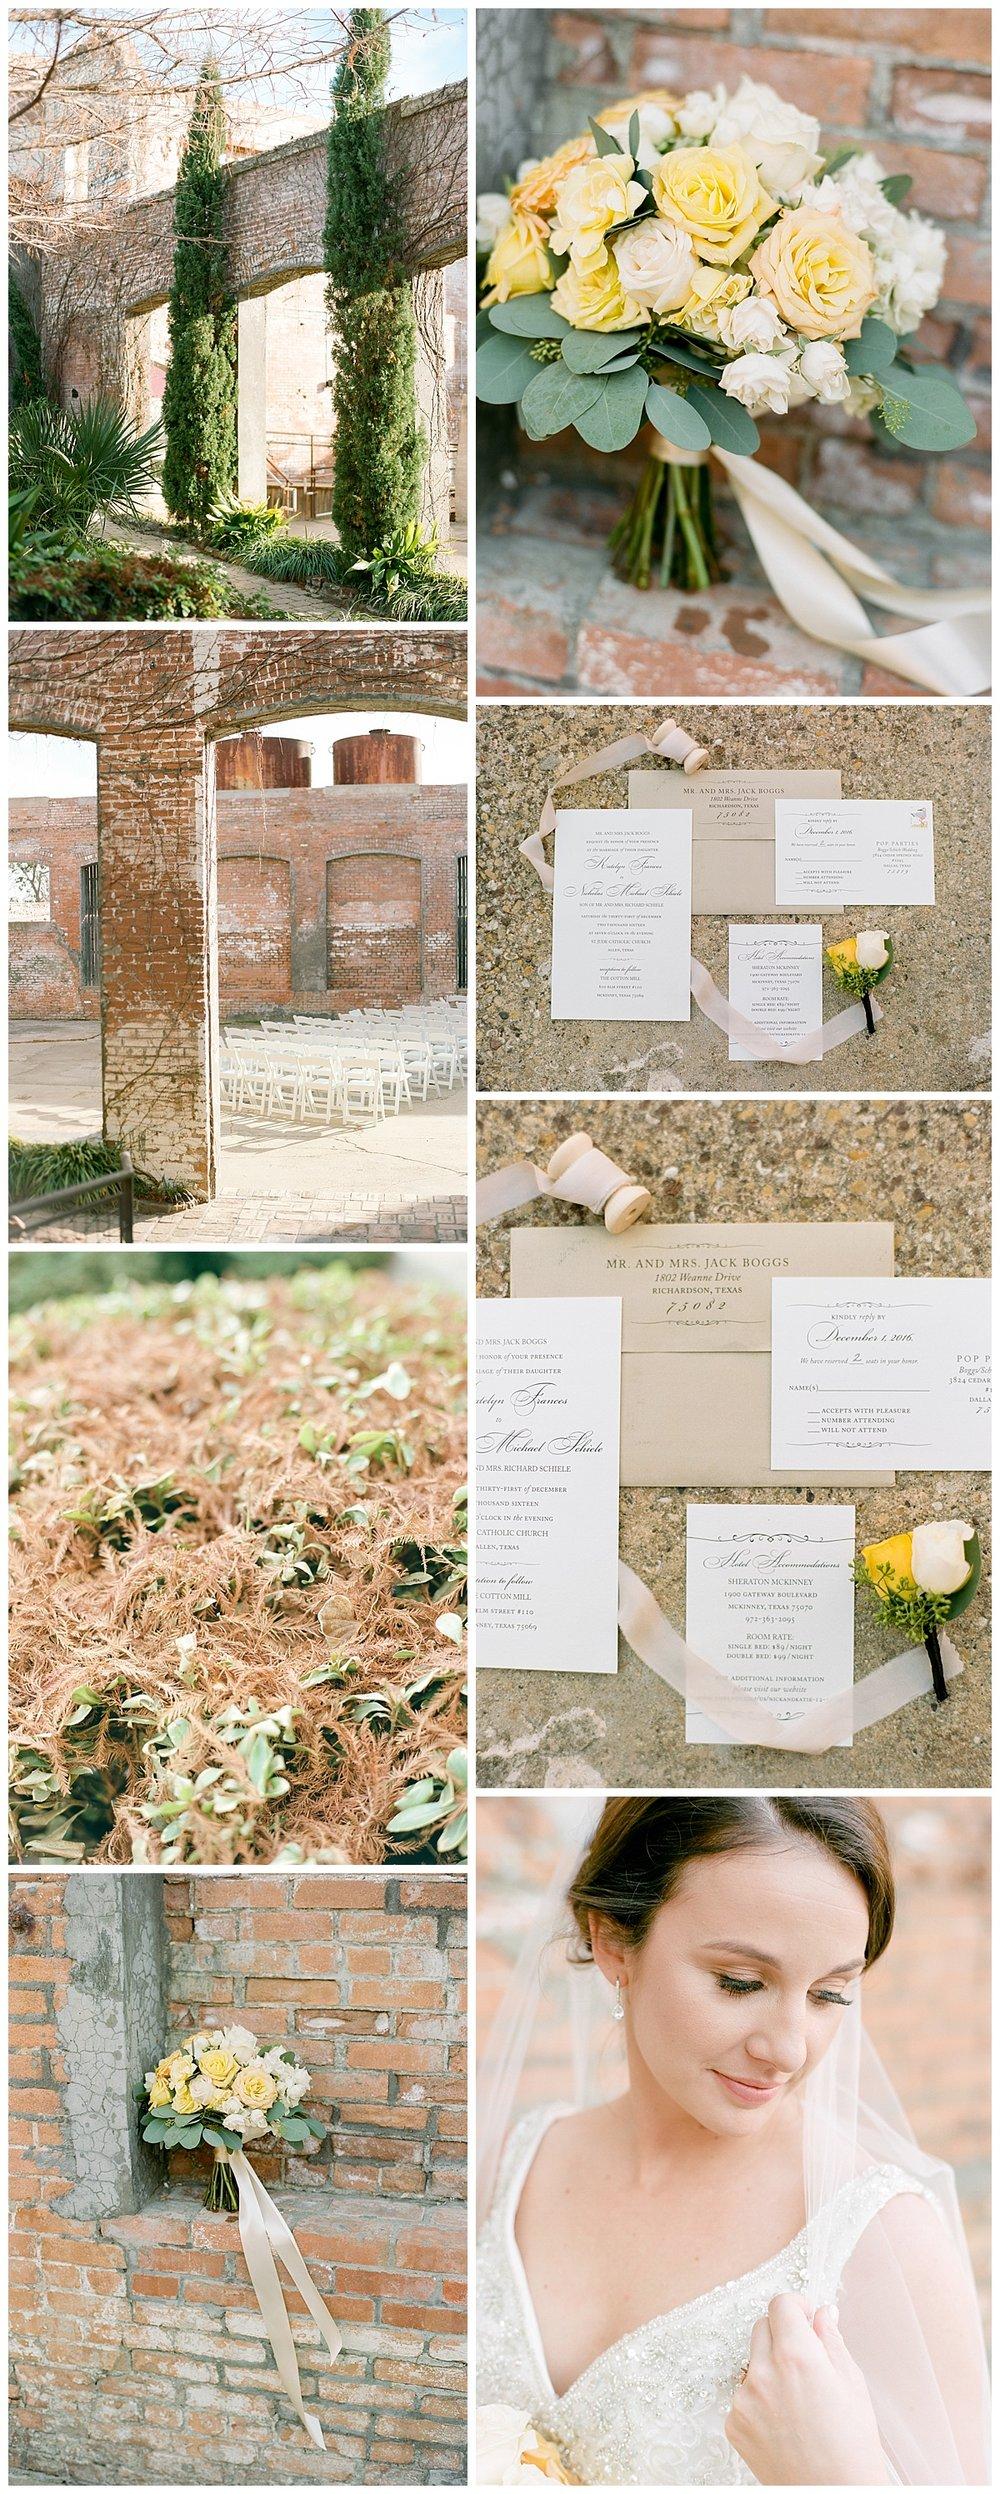 the-cotton-mill-wedding-ar-photography-3.jpg